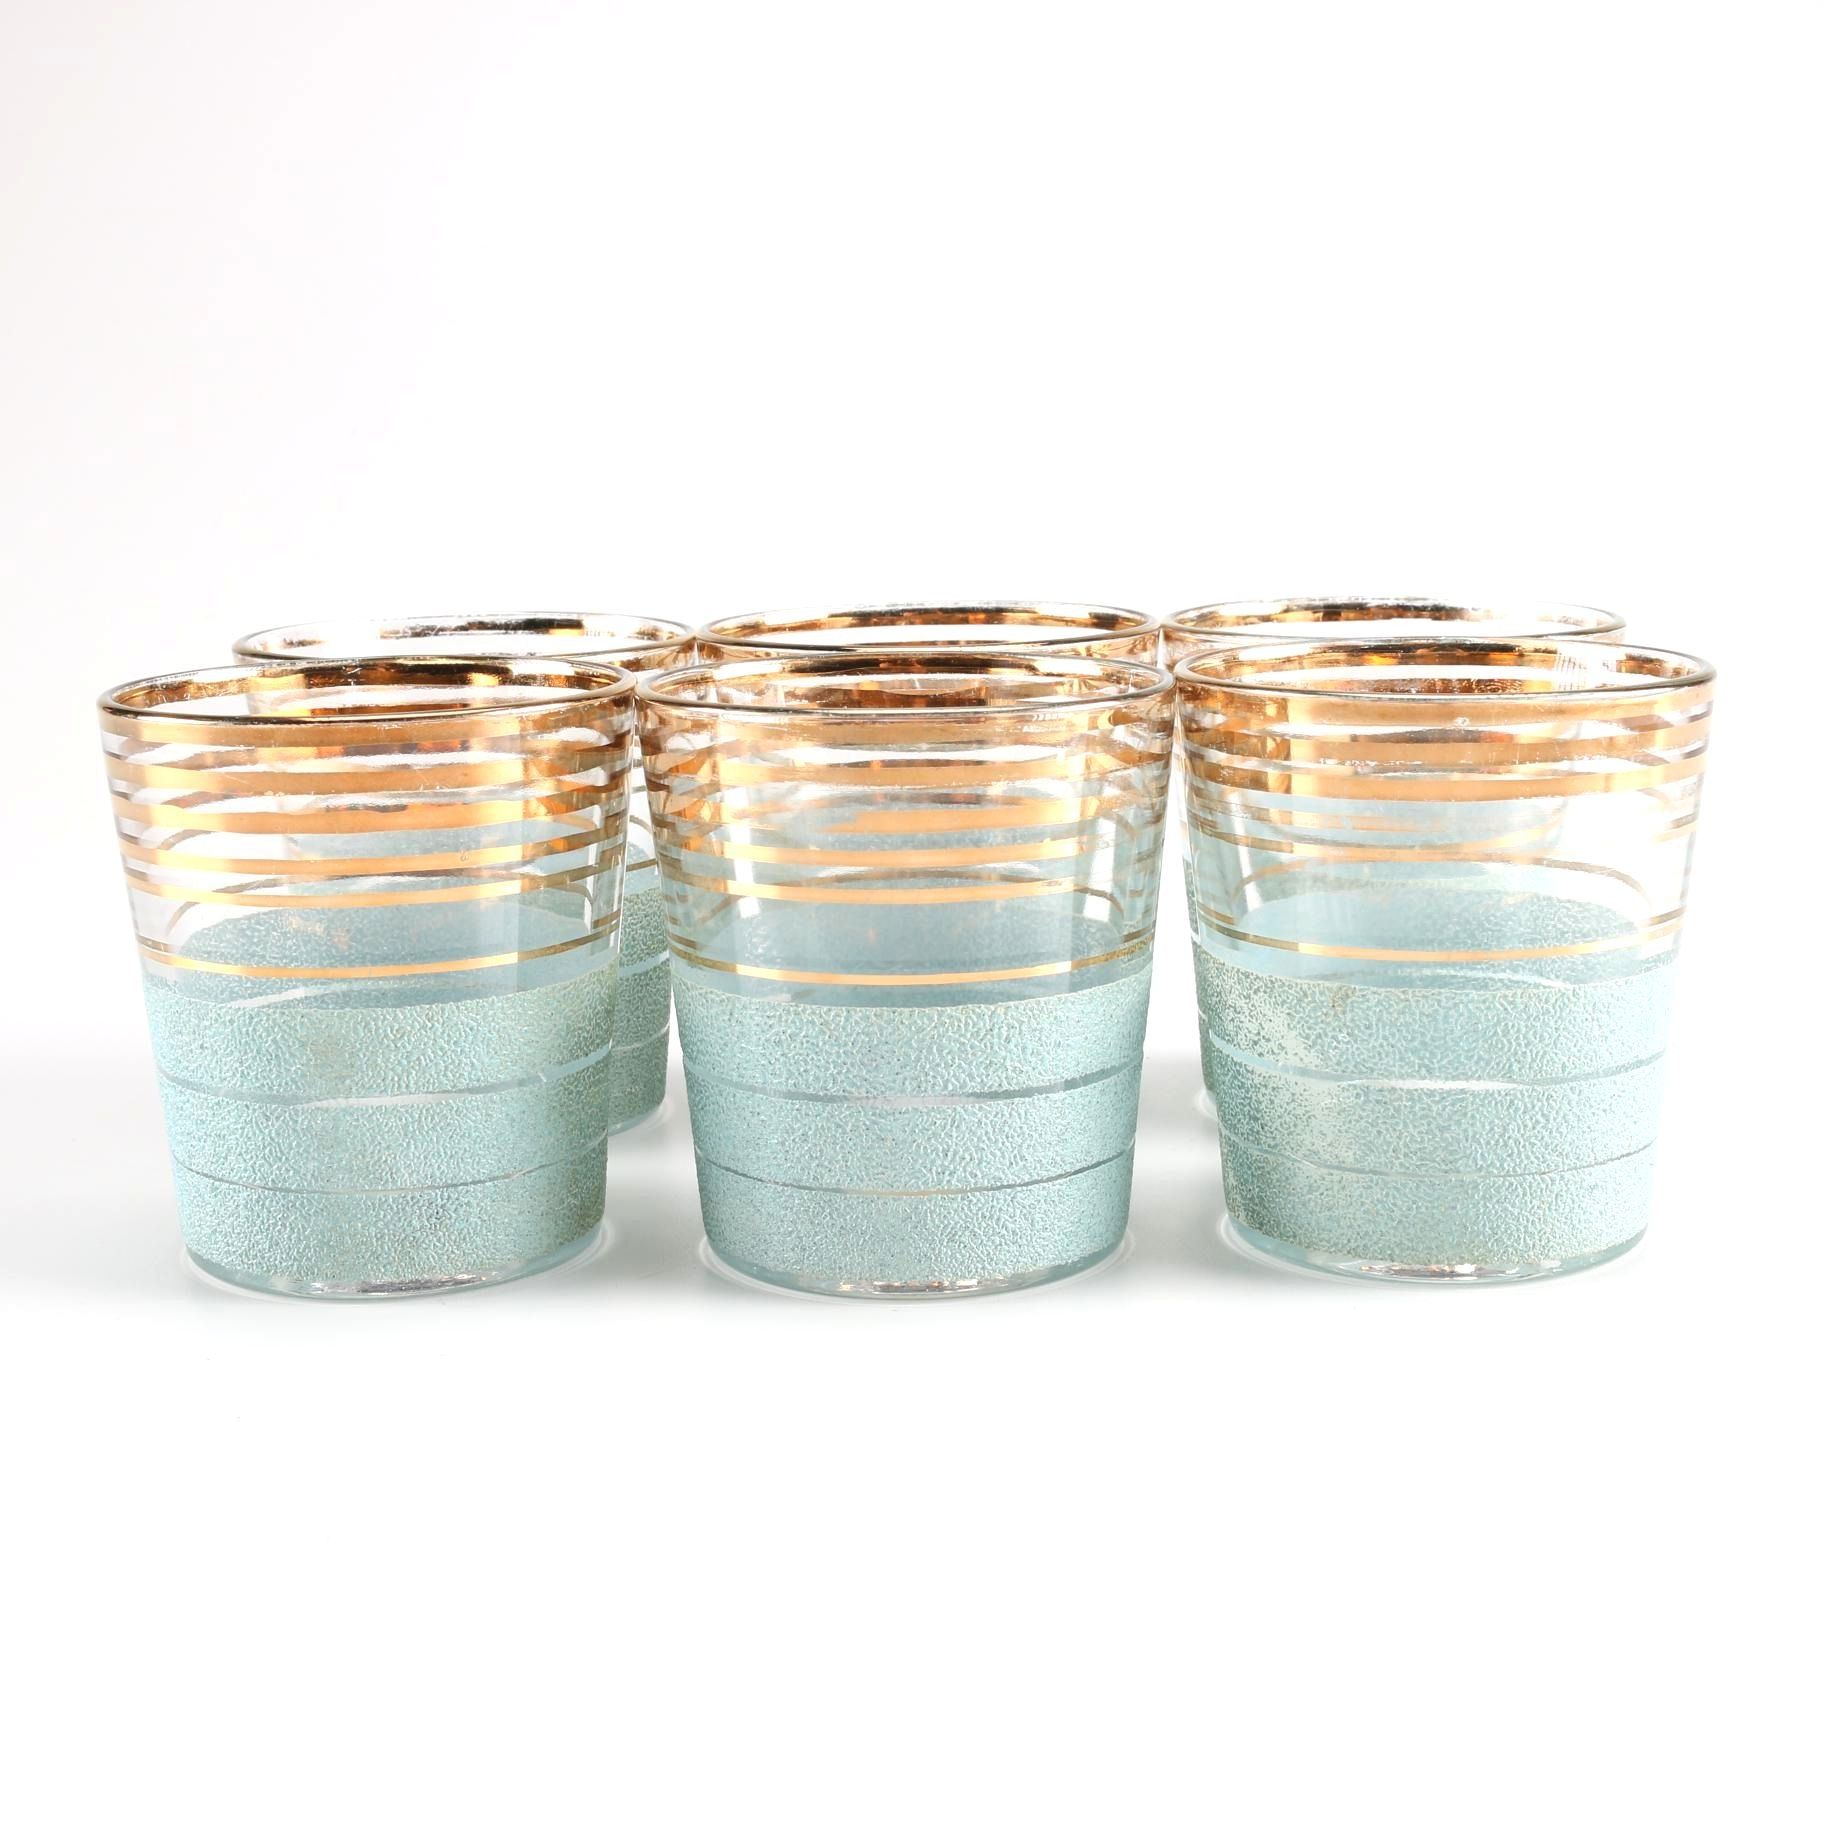 Set of Gold Tone Glasses